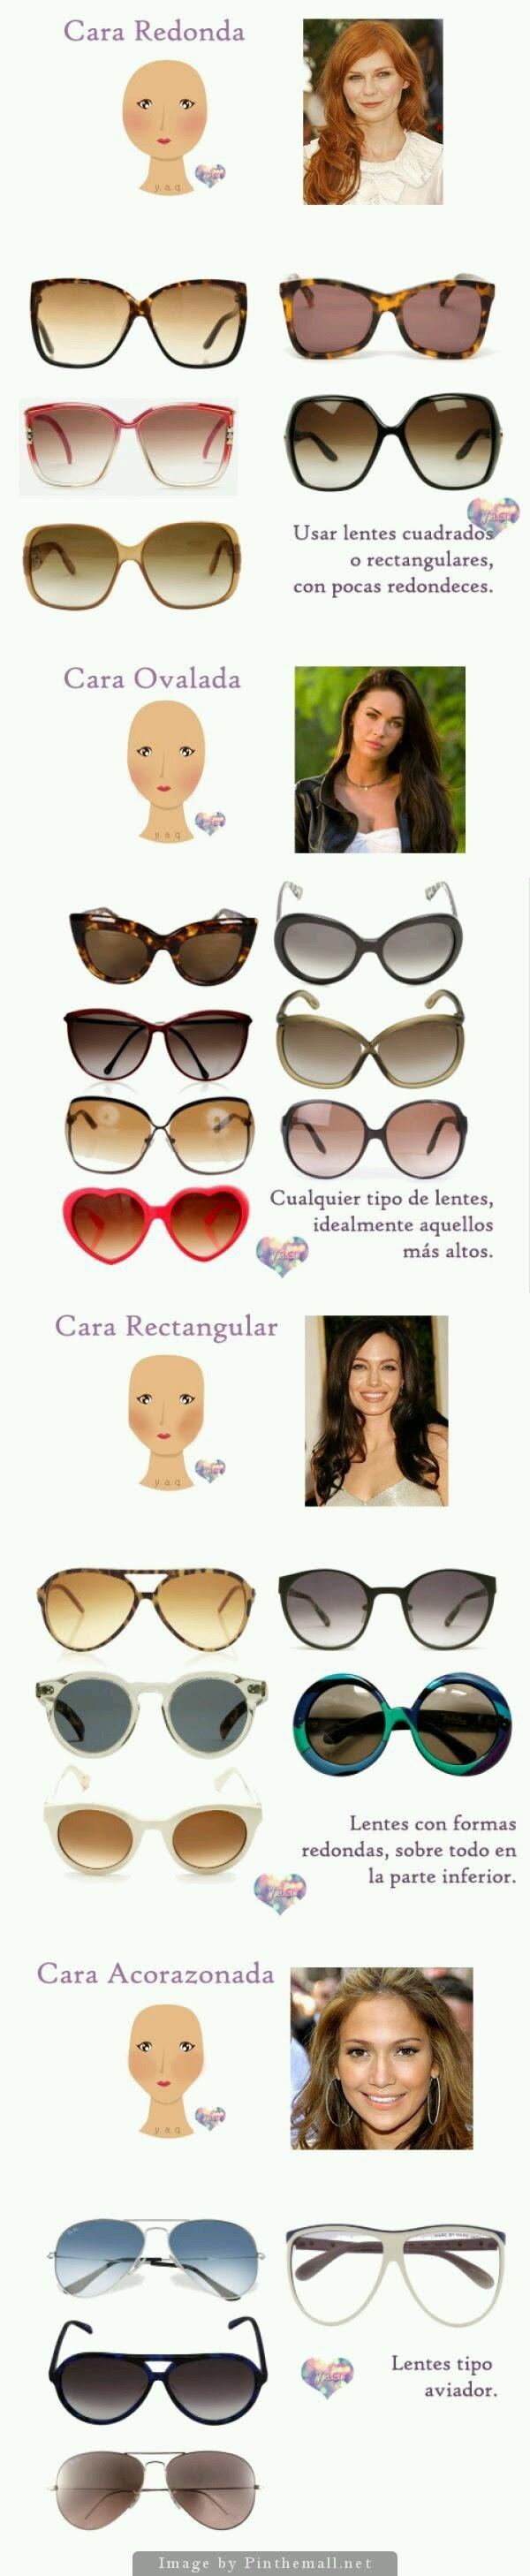 How you should choose sunglasses